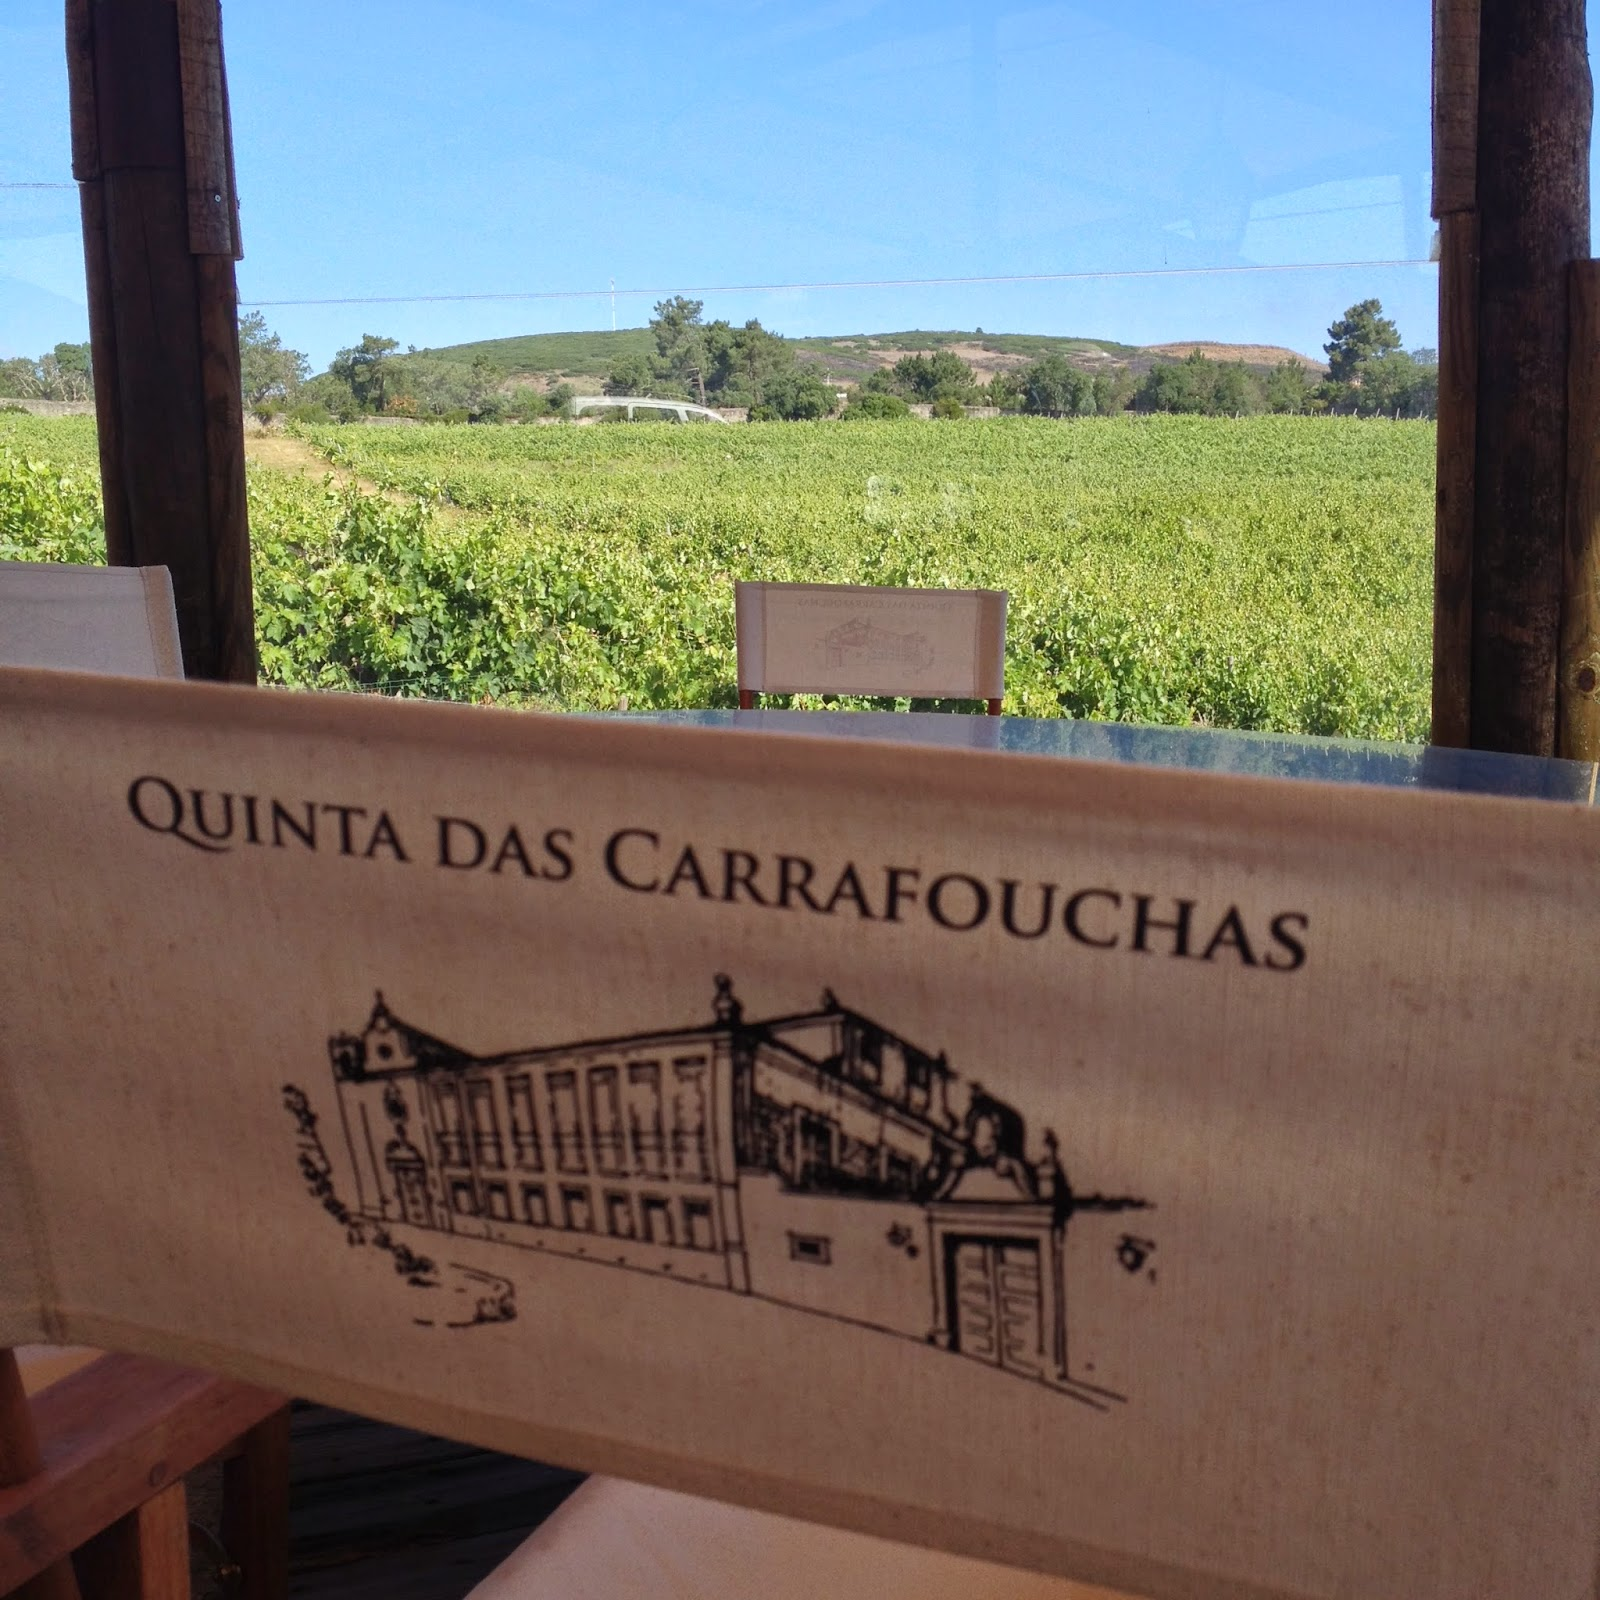 Visita à Quinta das Carrafouchas